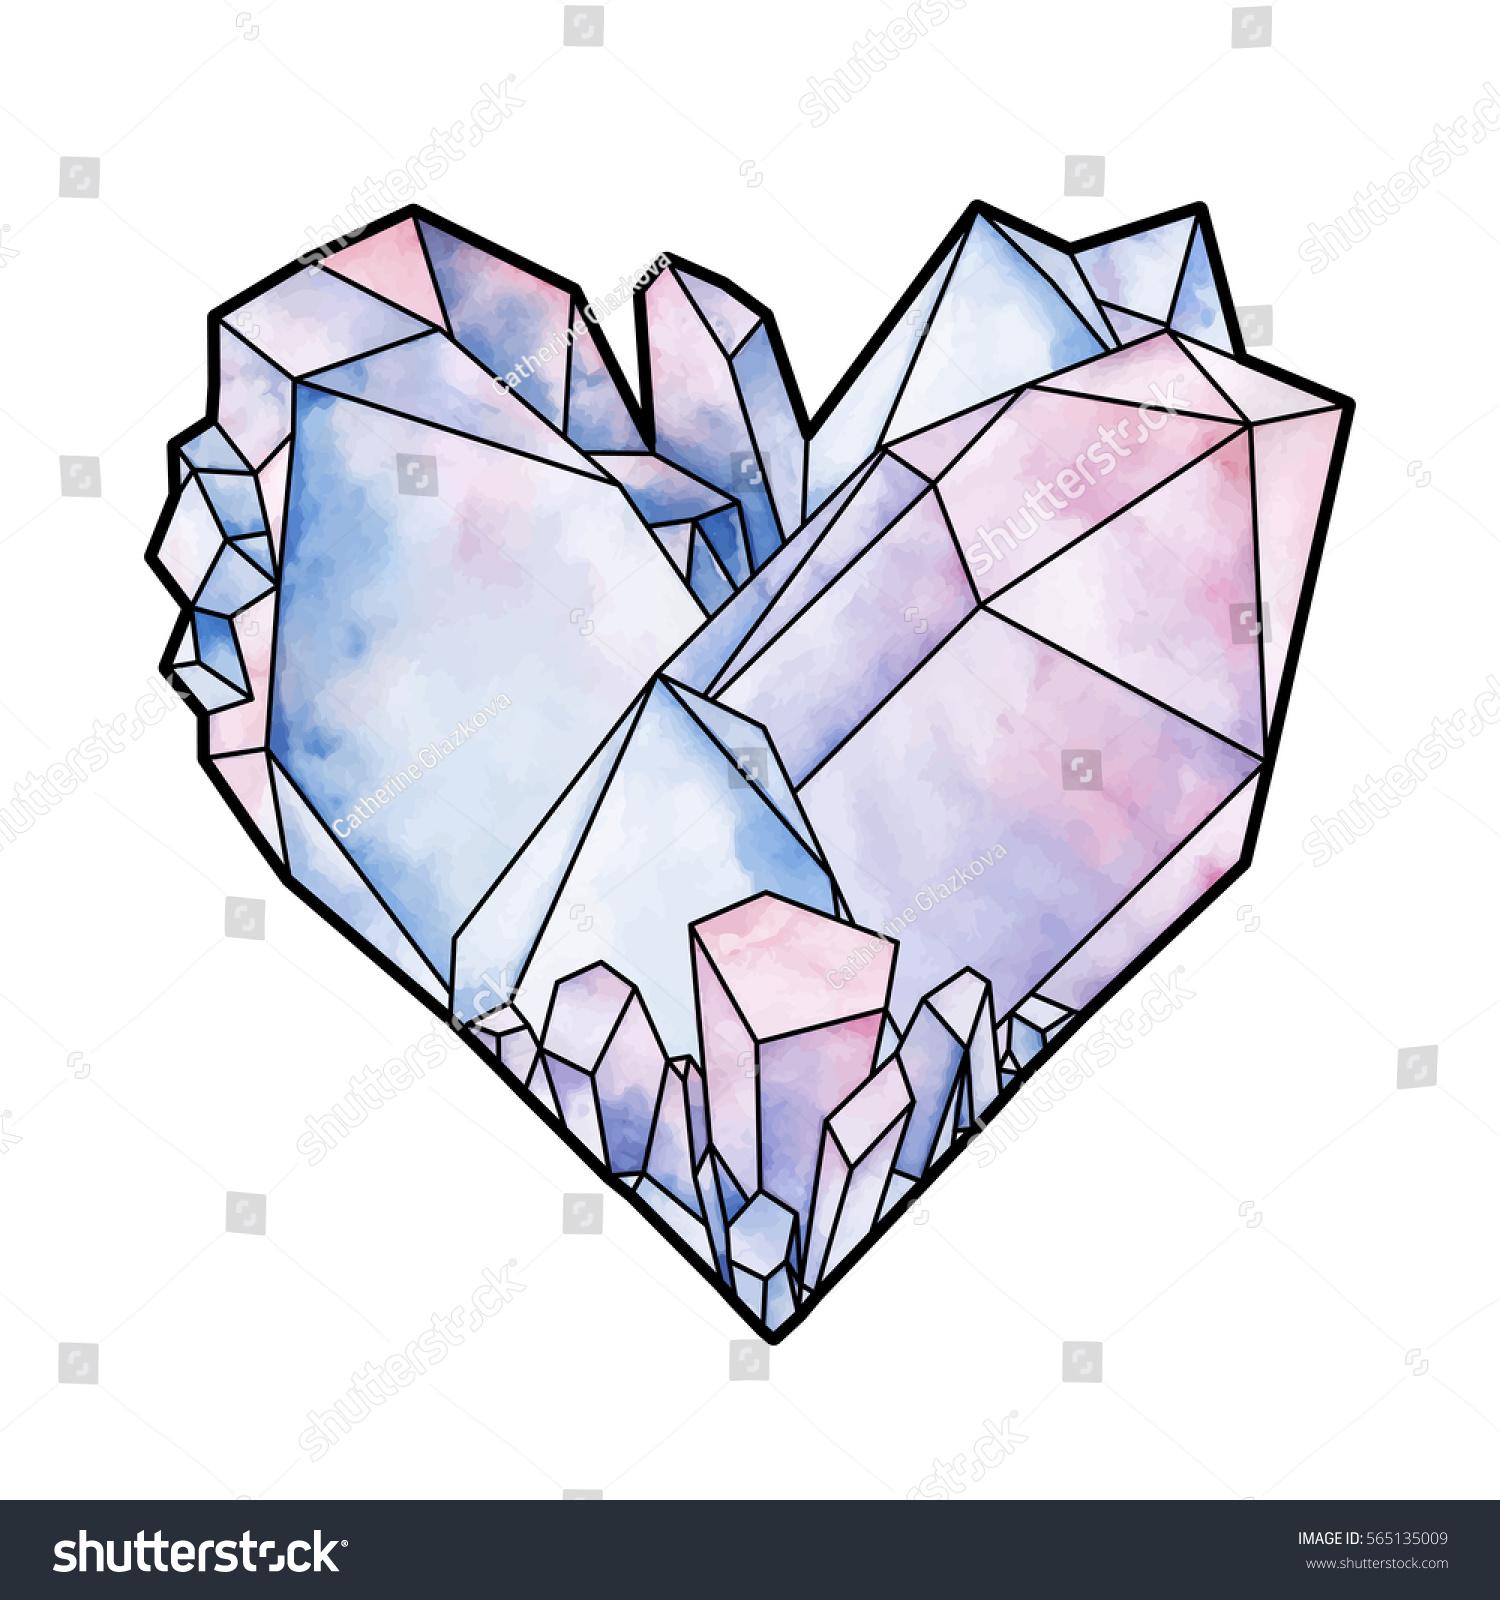 Schön Graphic Crystals Shape Heart Vector Valentine Stock Vector .